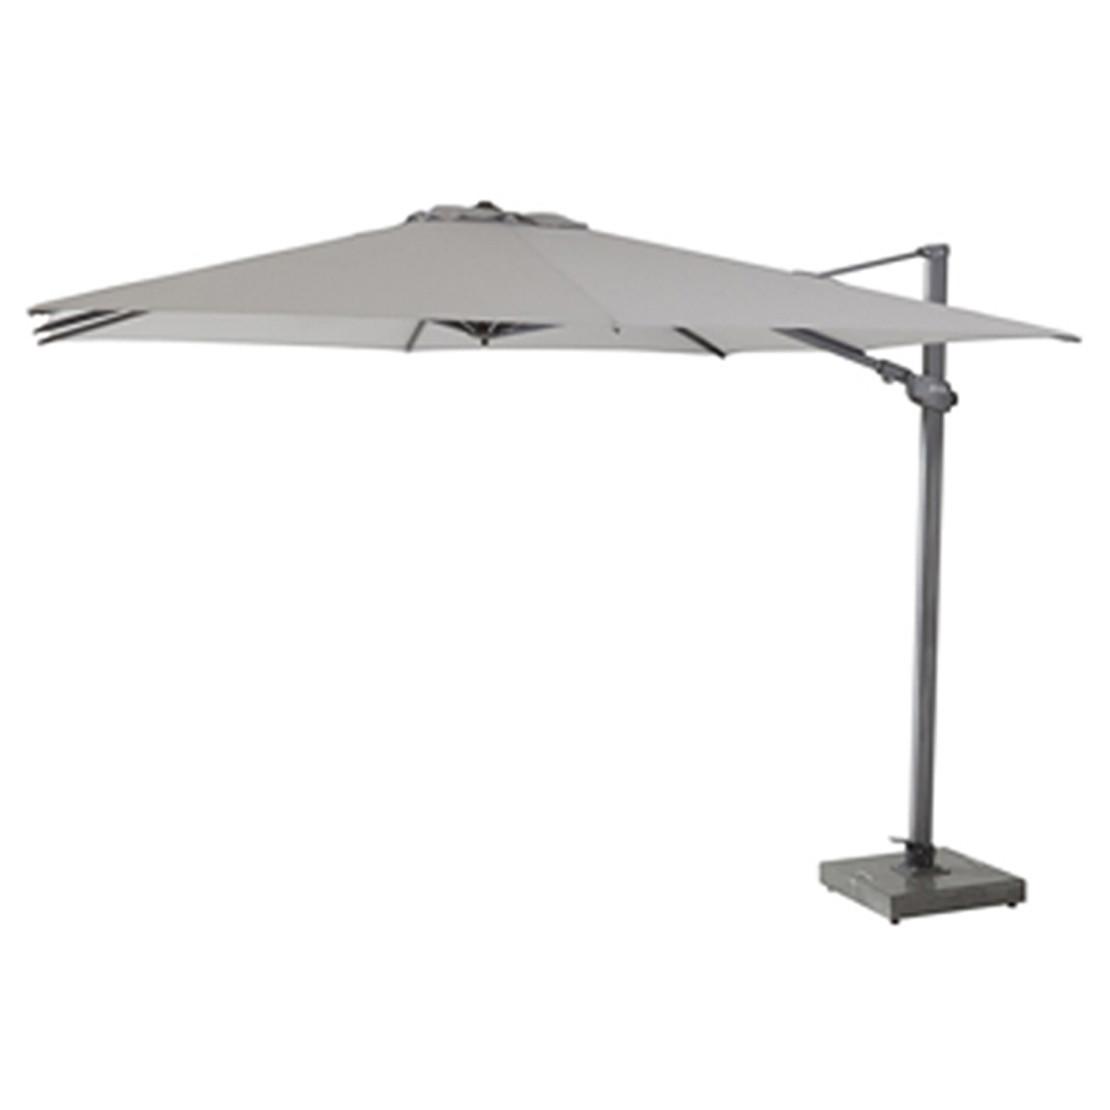 Siesta Premium 300 x 300 cm Mid Grey